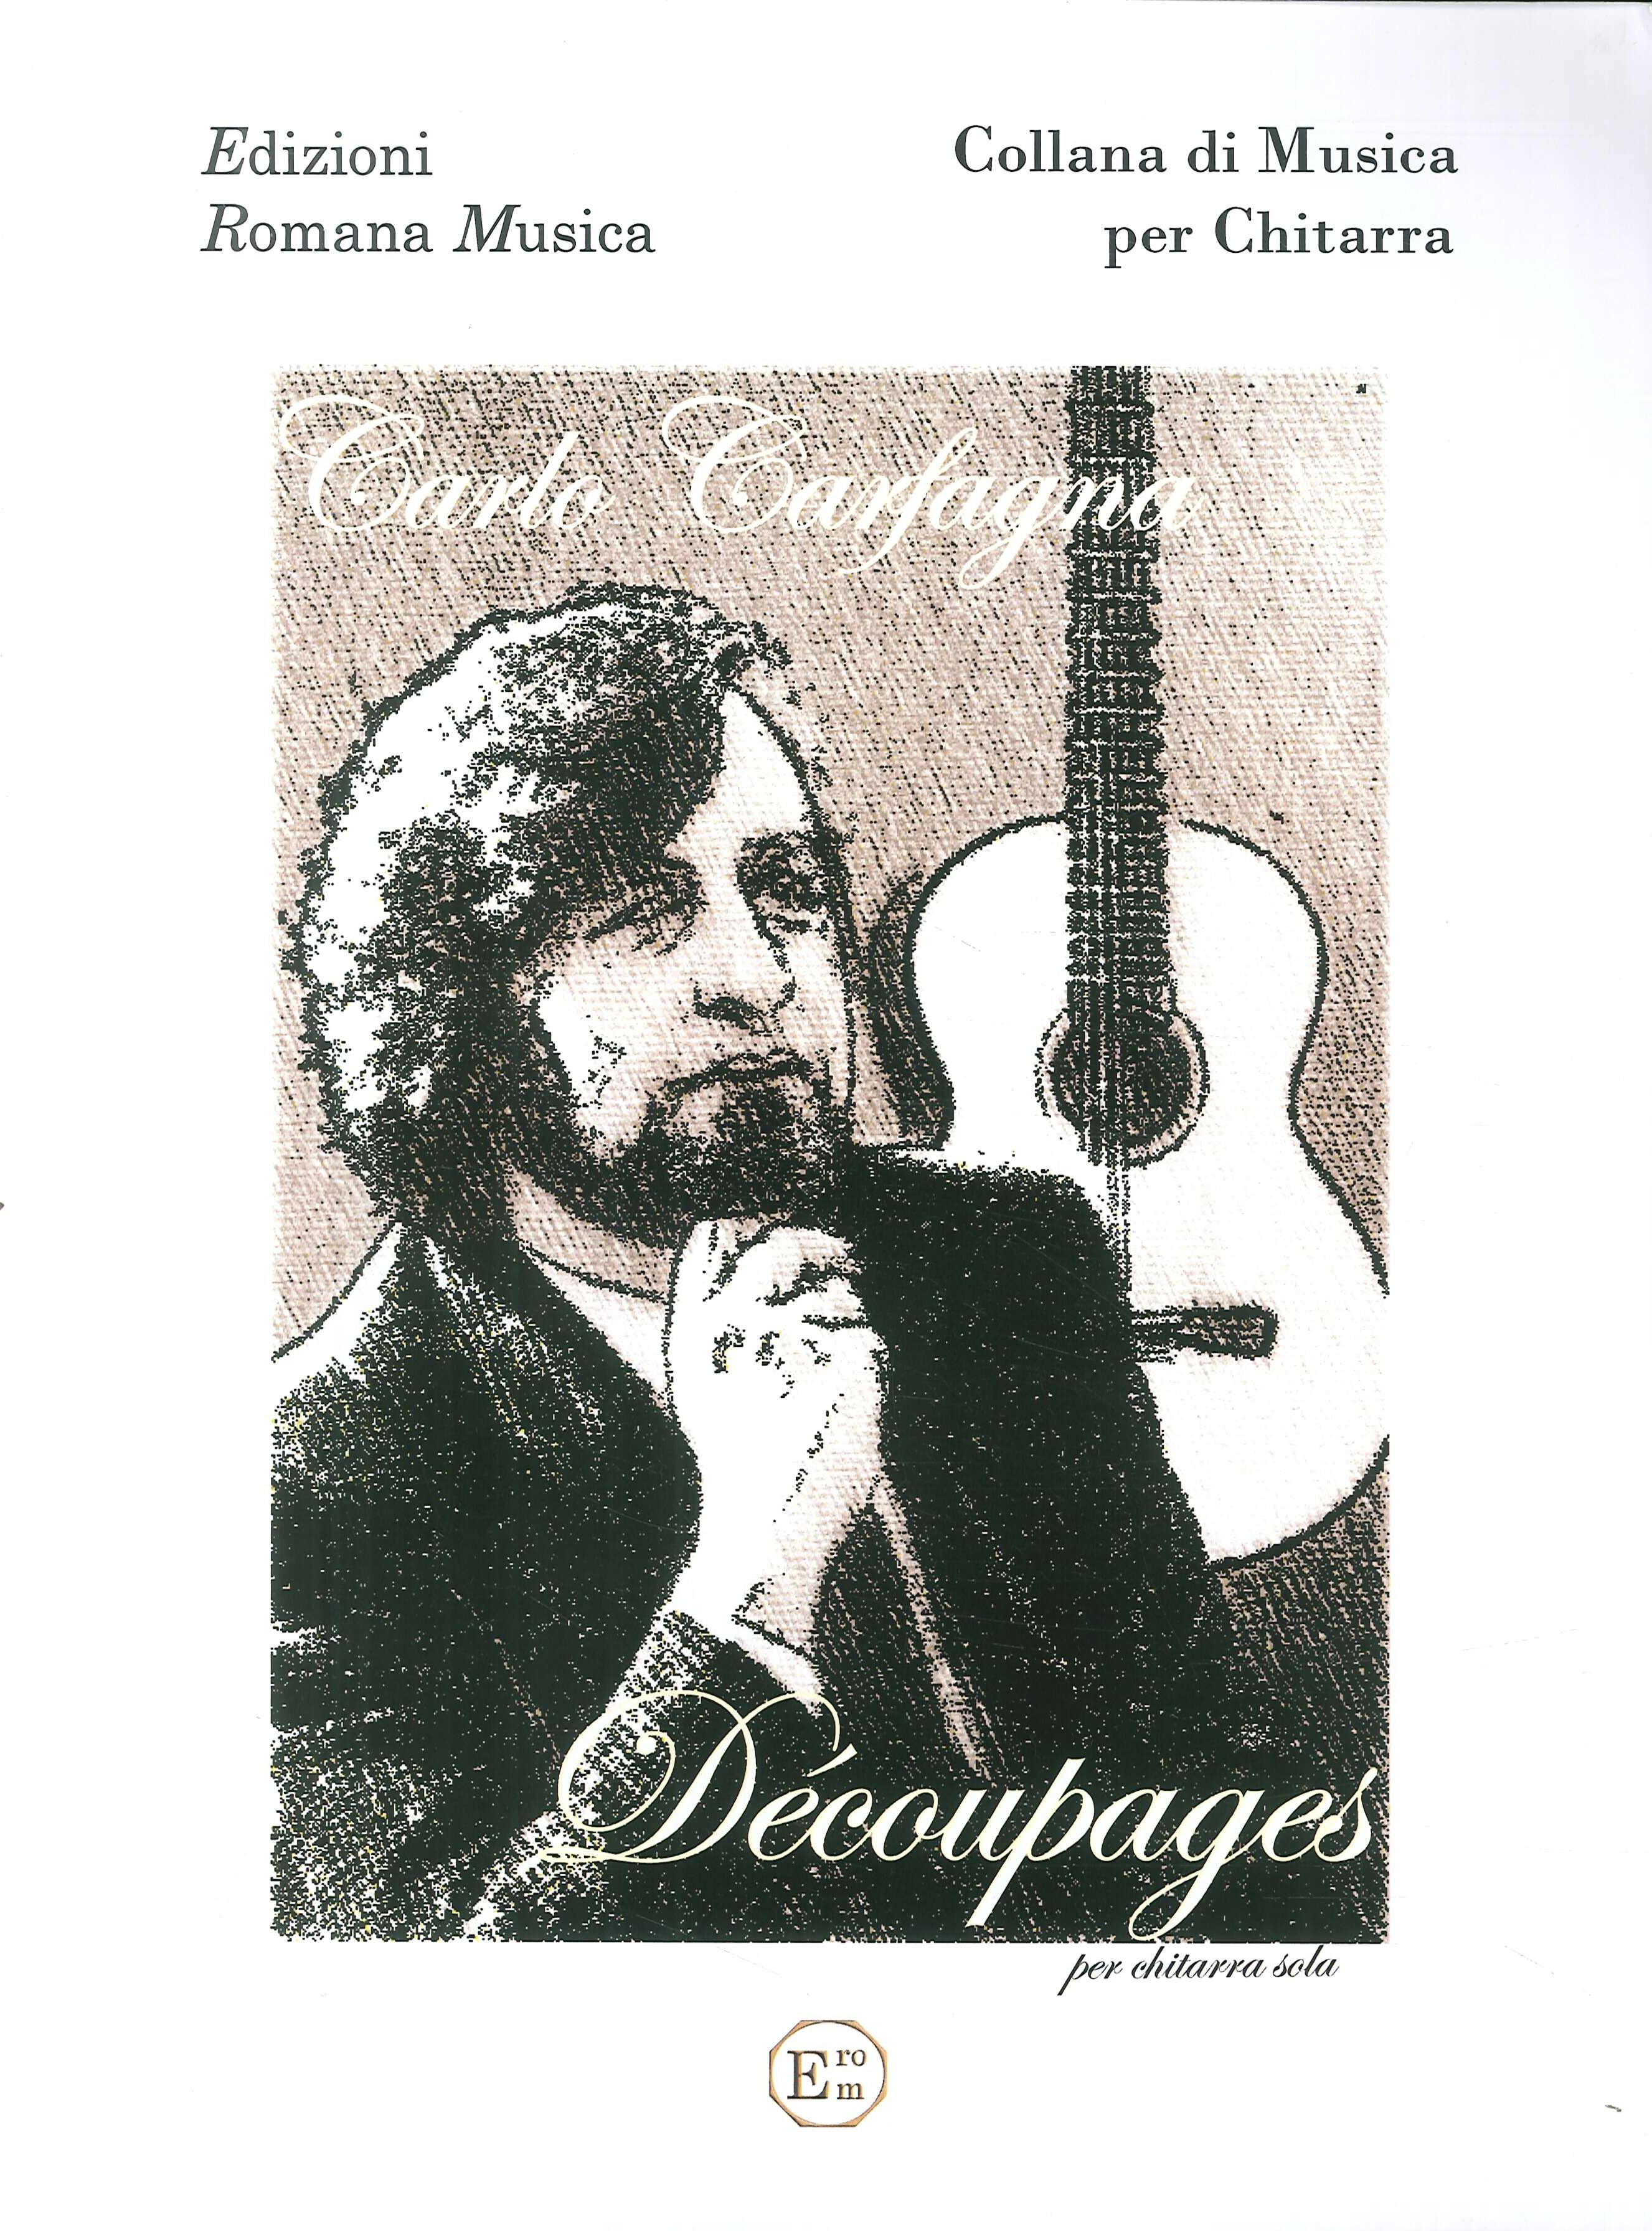 Carlo Carfagna. Decoupages. Musica per Chitarra. Erom 0075